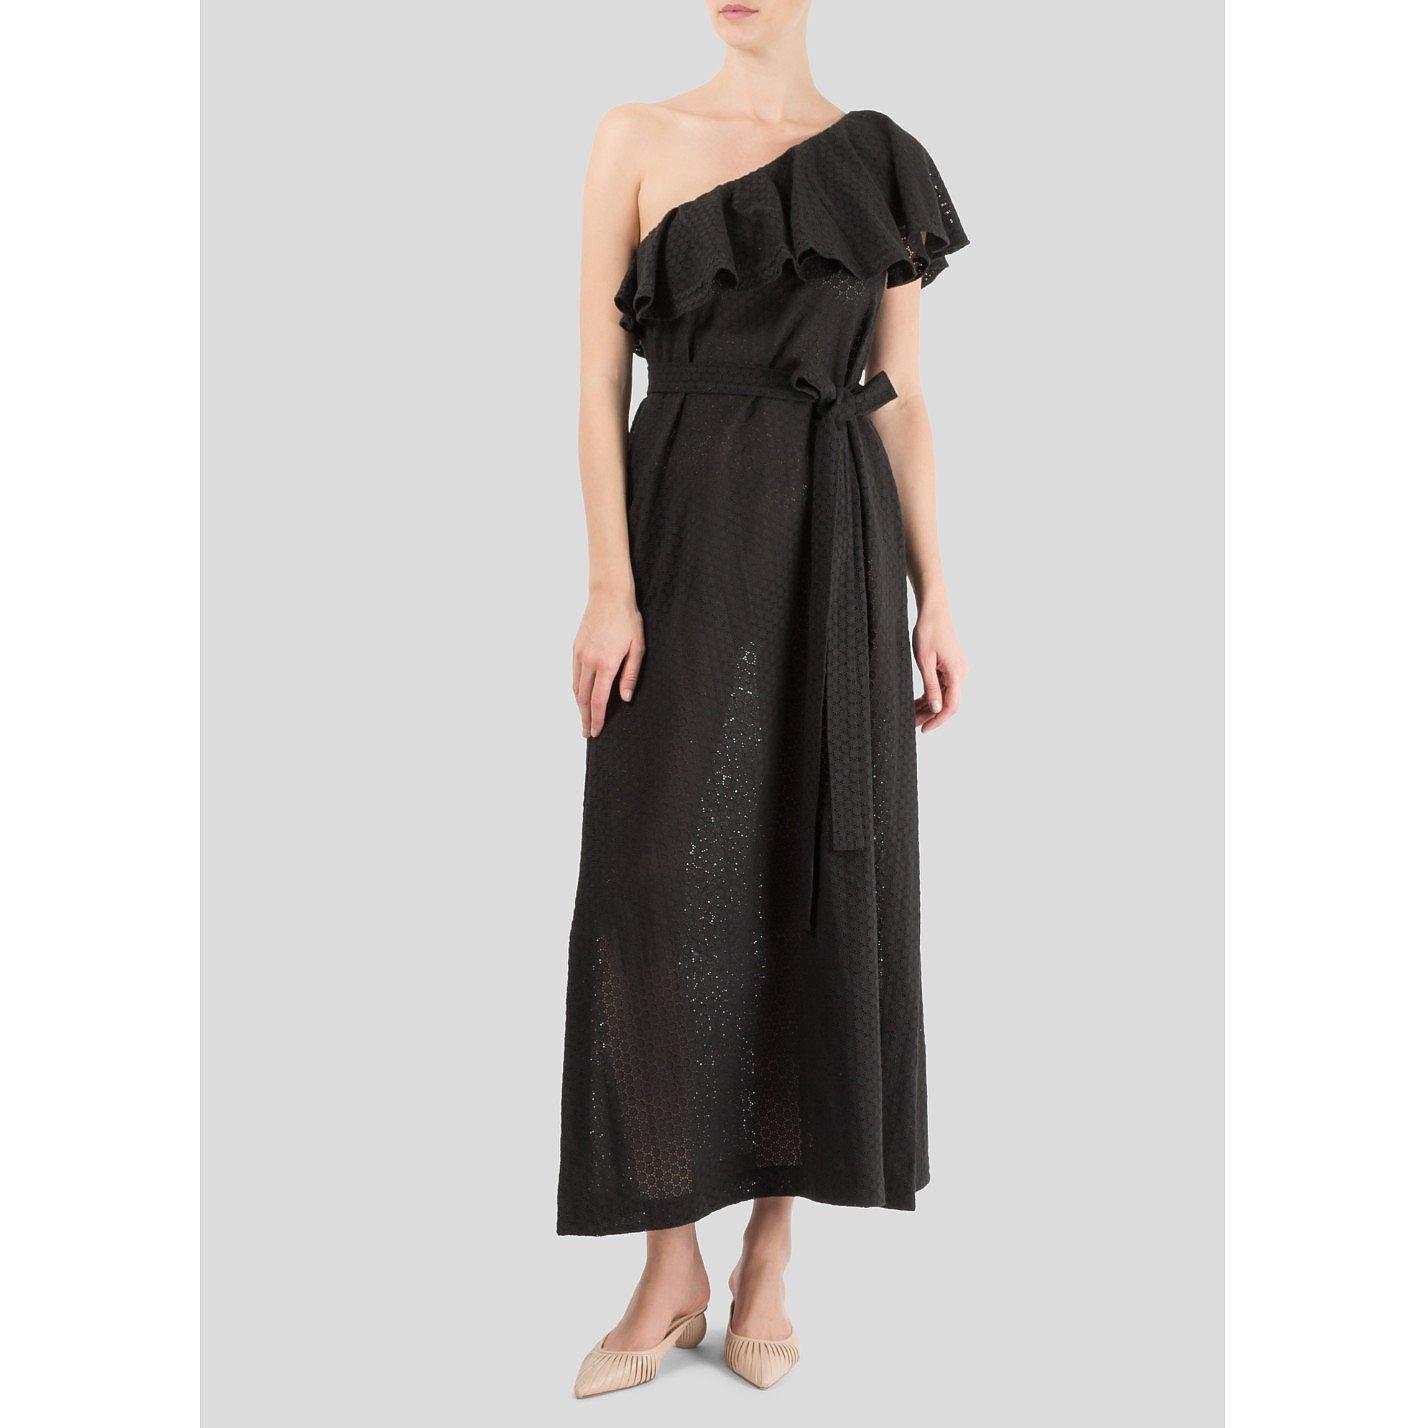 Lisa Marie Fernandez Arden Ruffled Shoulder Dress